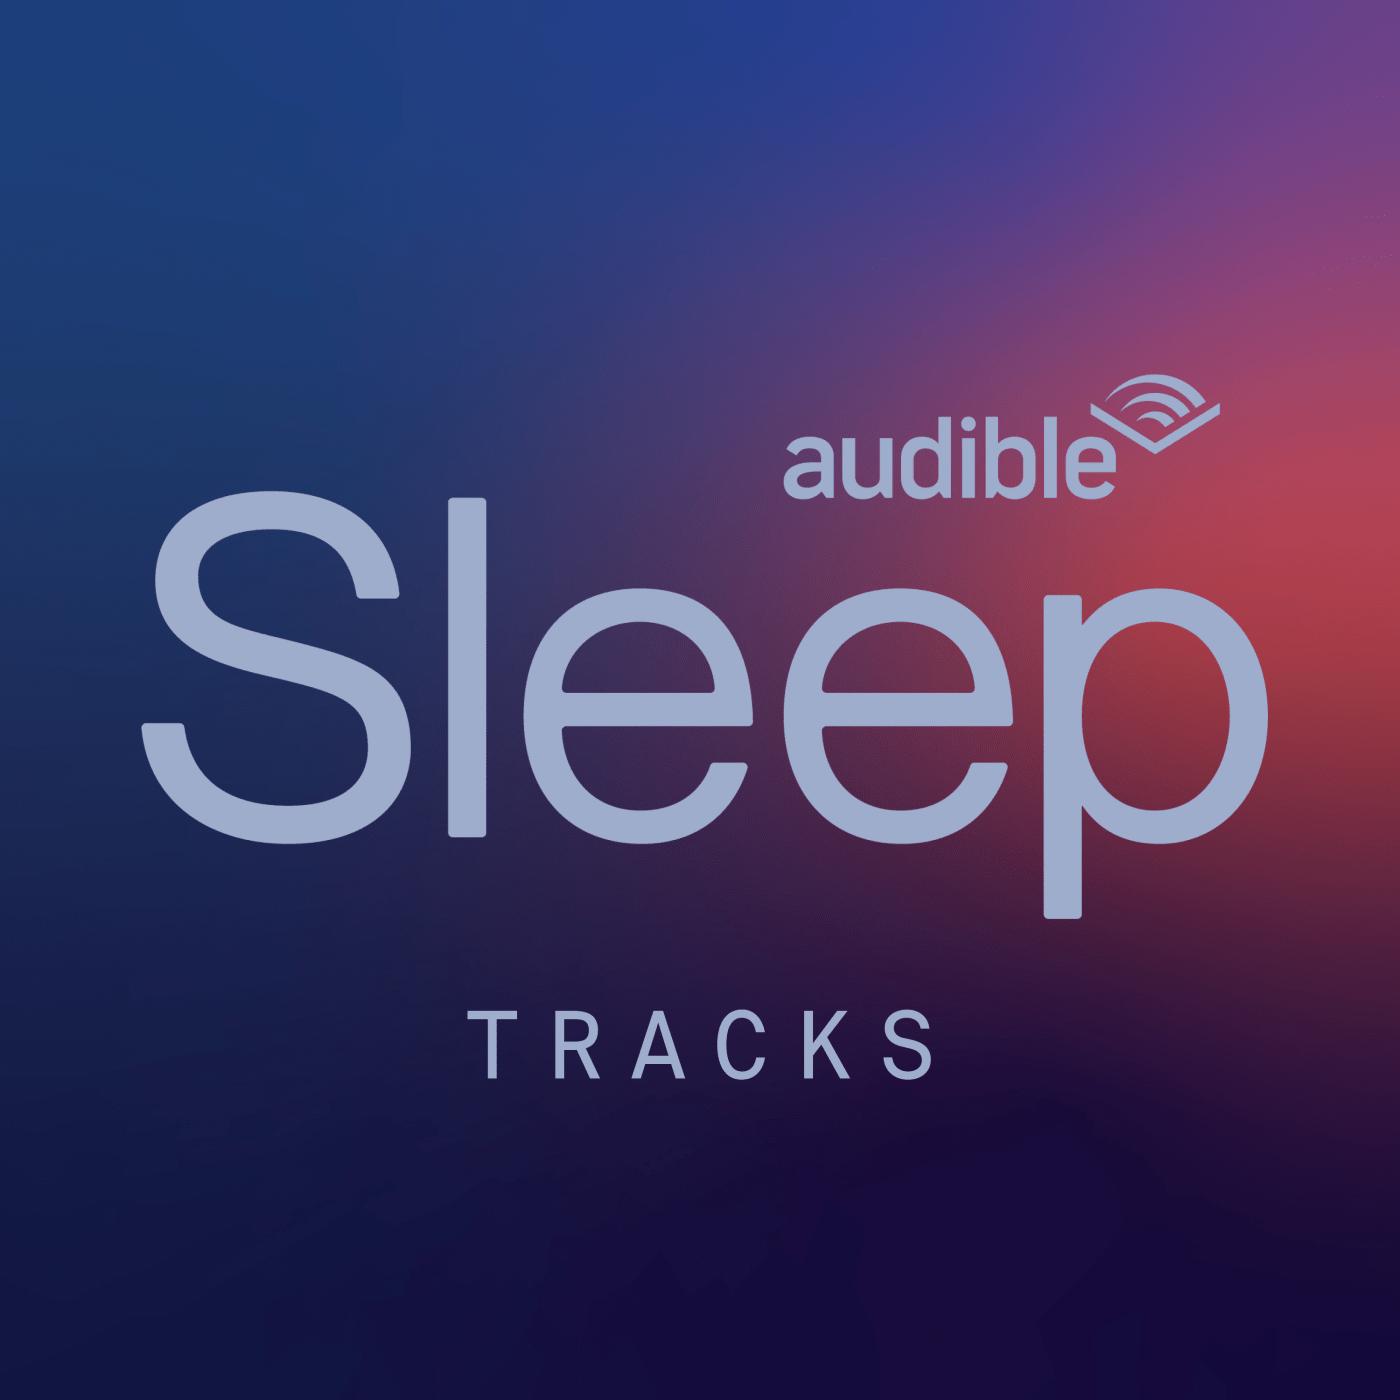 Audible Sleep Tracks logo